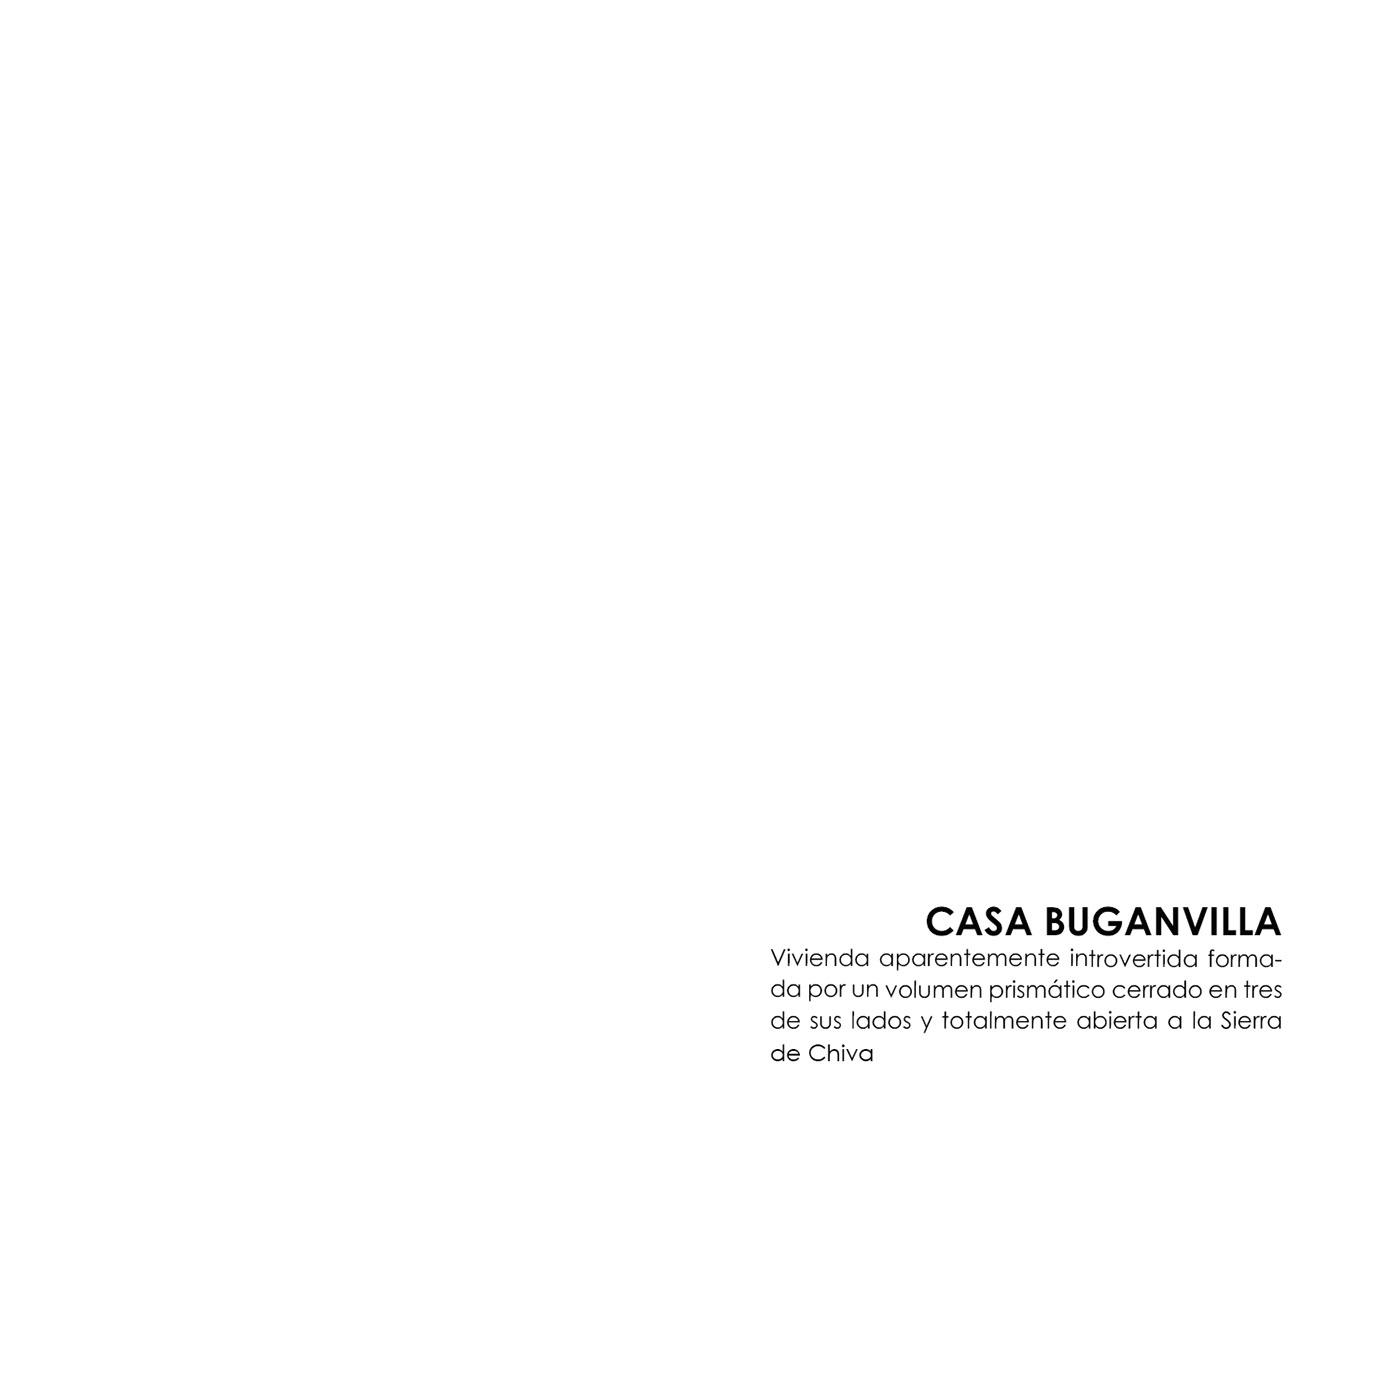 architect architecture buganvilla building design house minimal modern Photography  spain